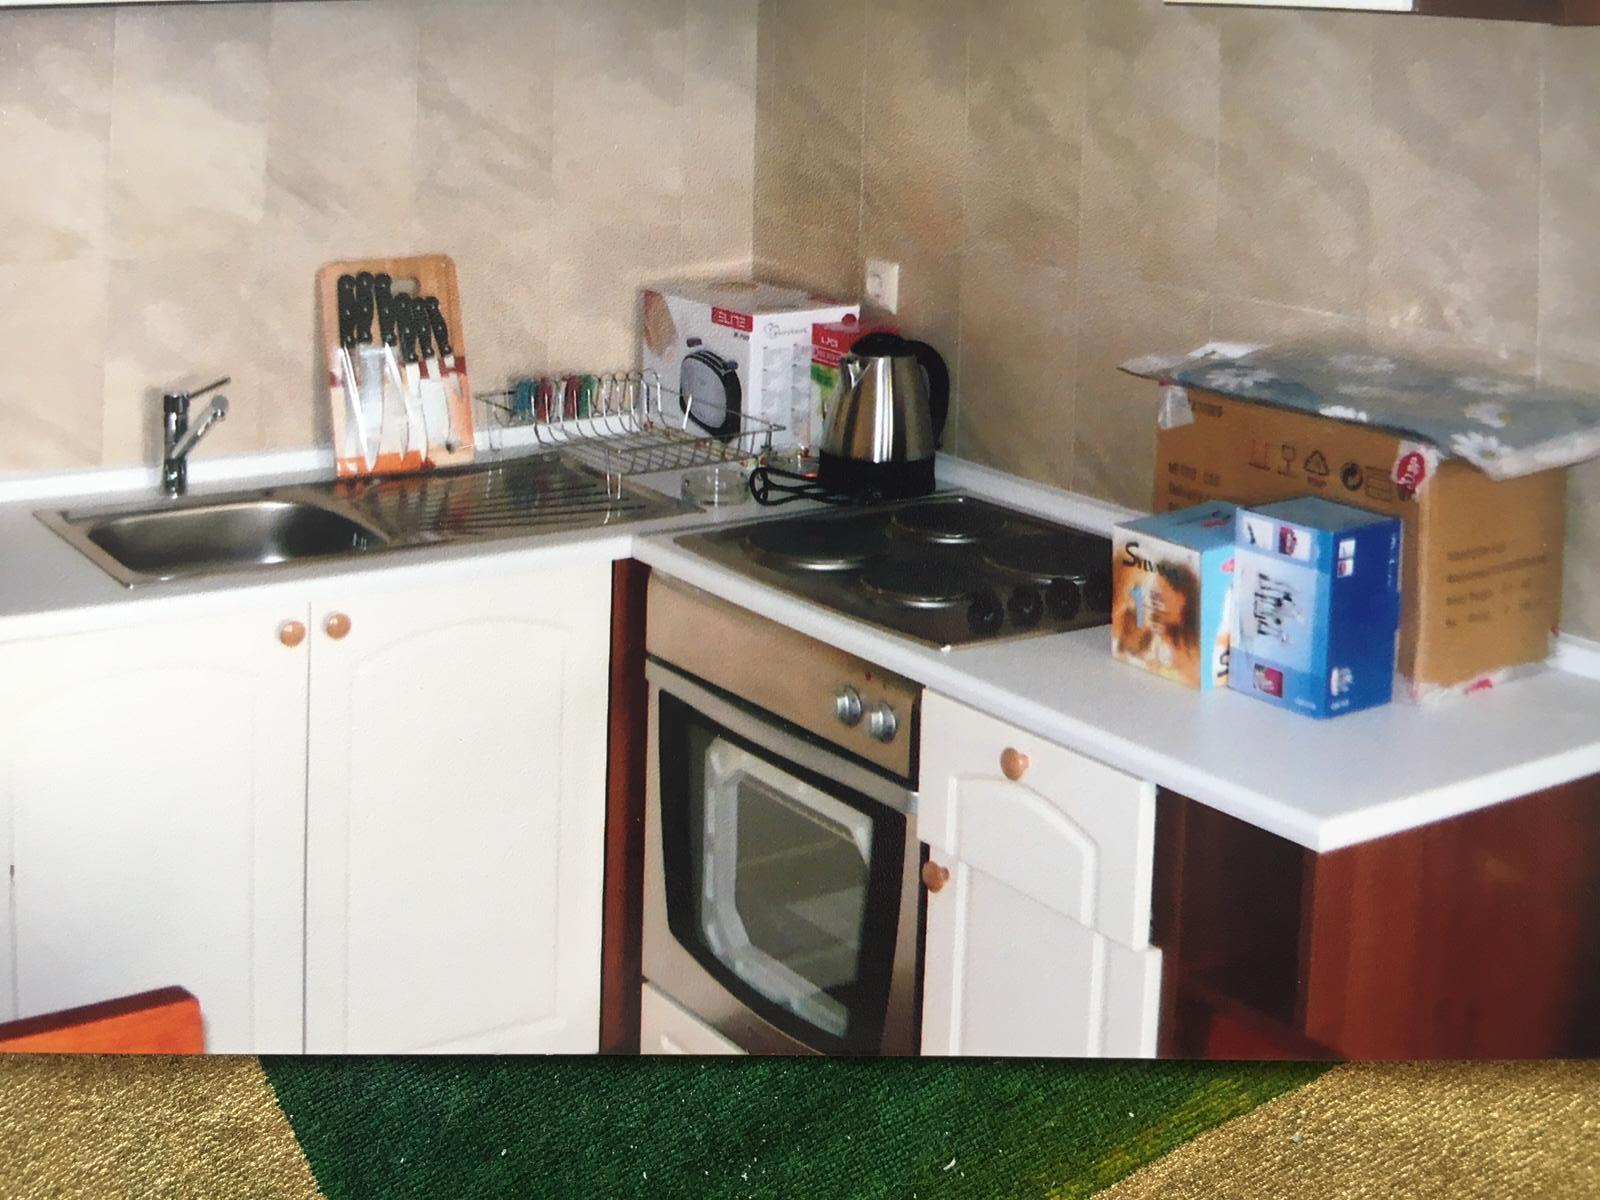 1569506680-sell-property-500ebf78-5210-4106-878f-85c4210532e0.jpg